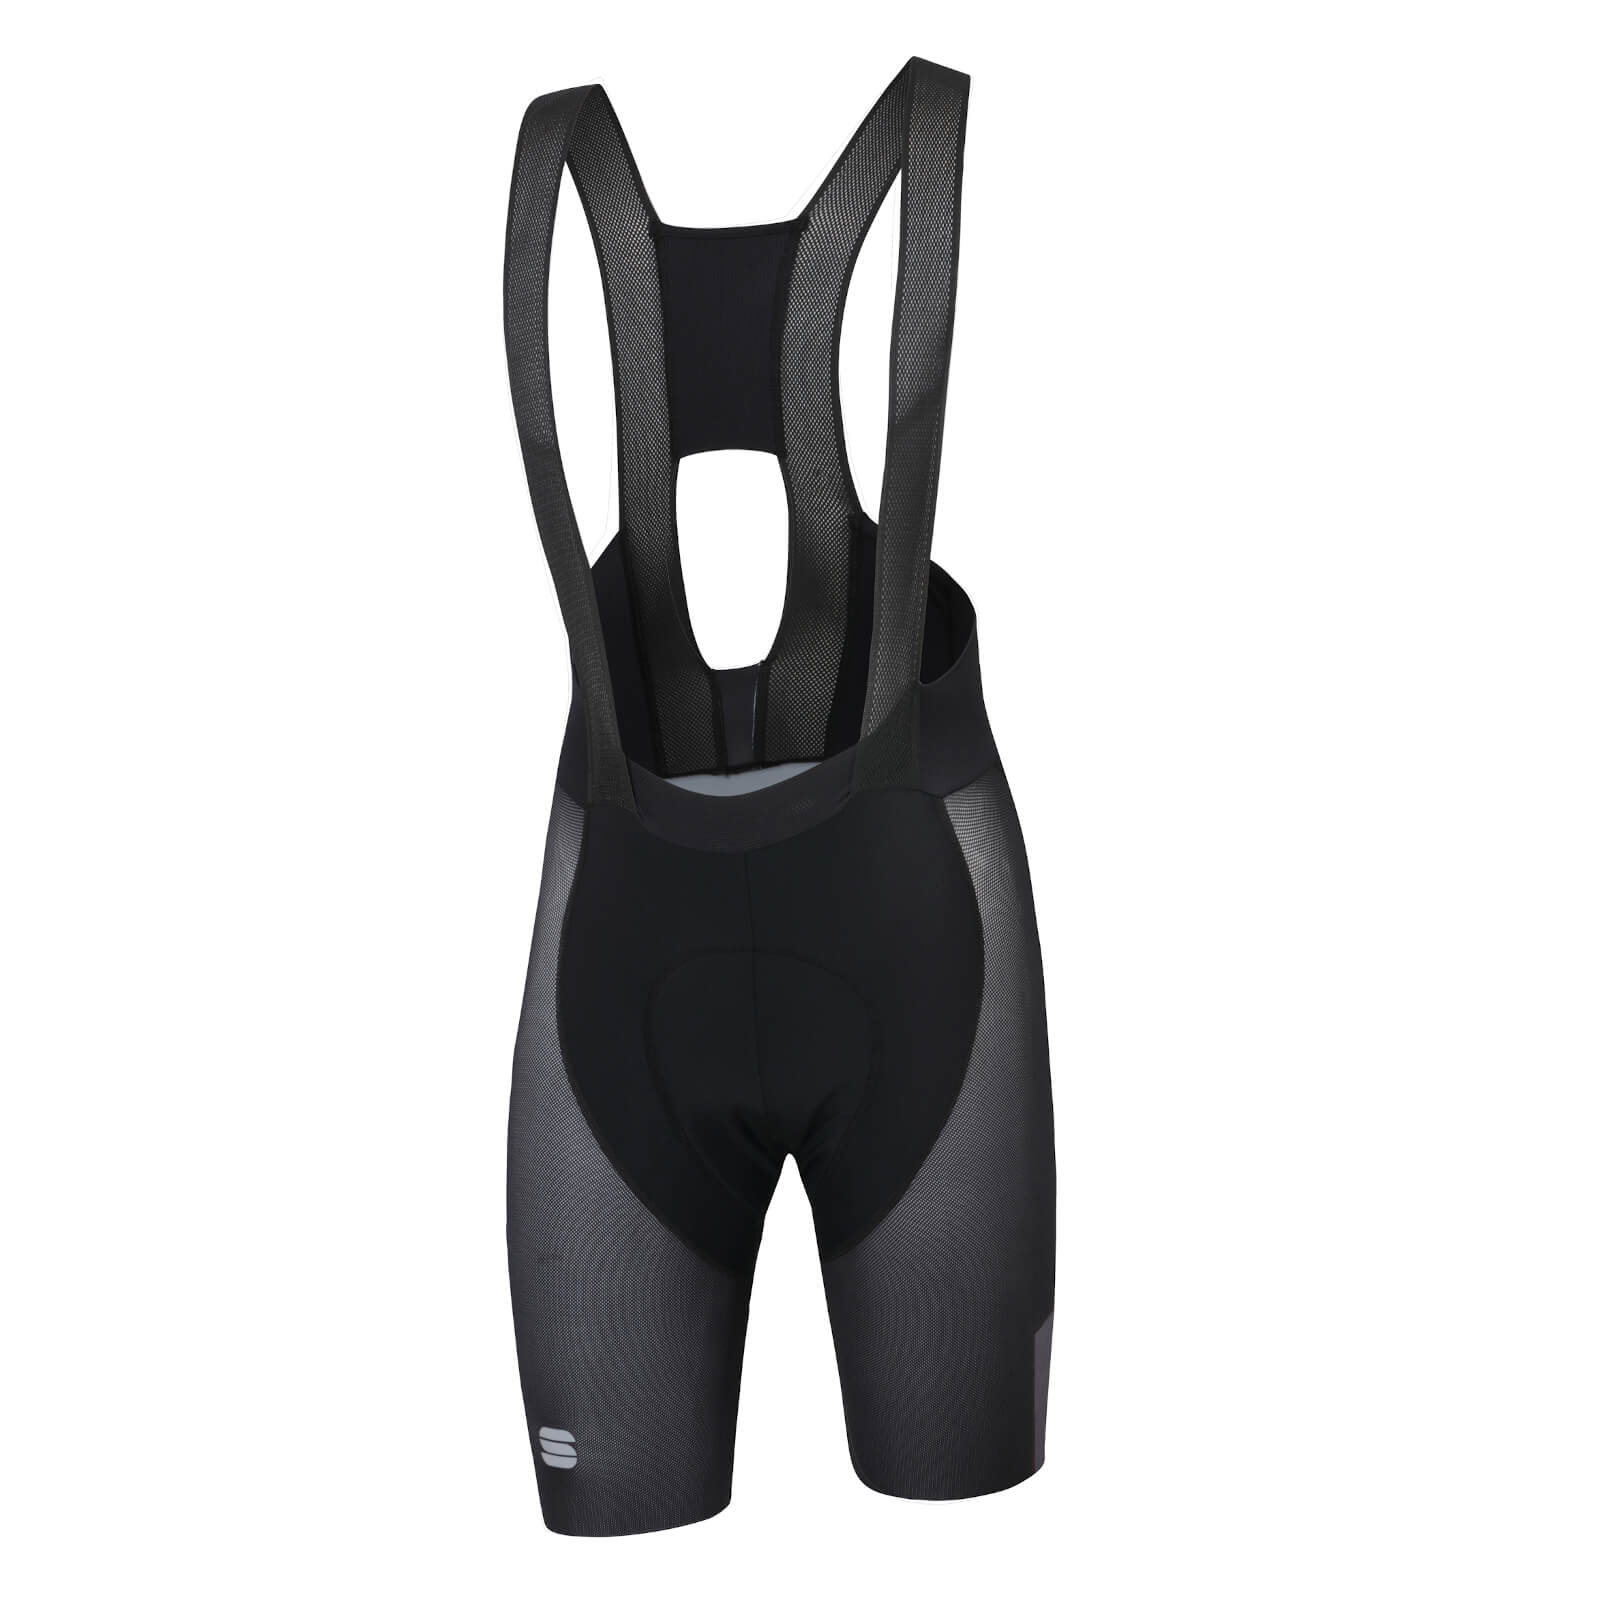 Sportful BodyFit Pro Air Bib Shorts - M - Black/Anthracite